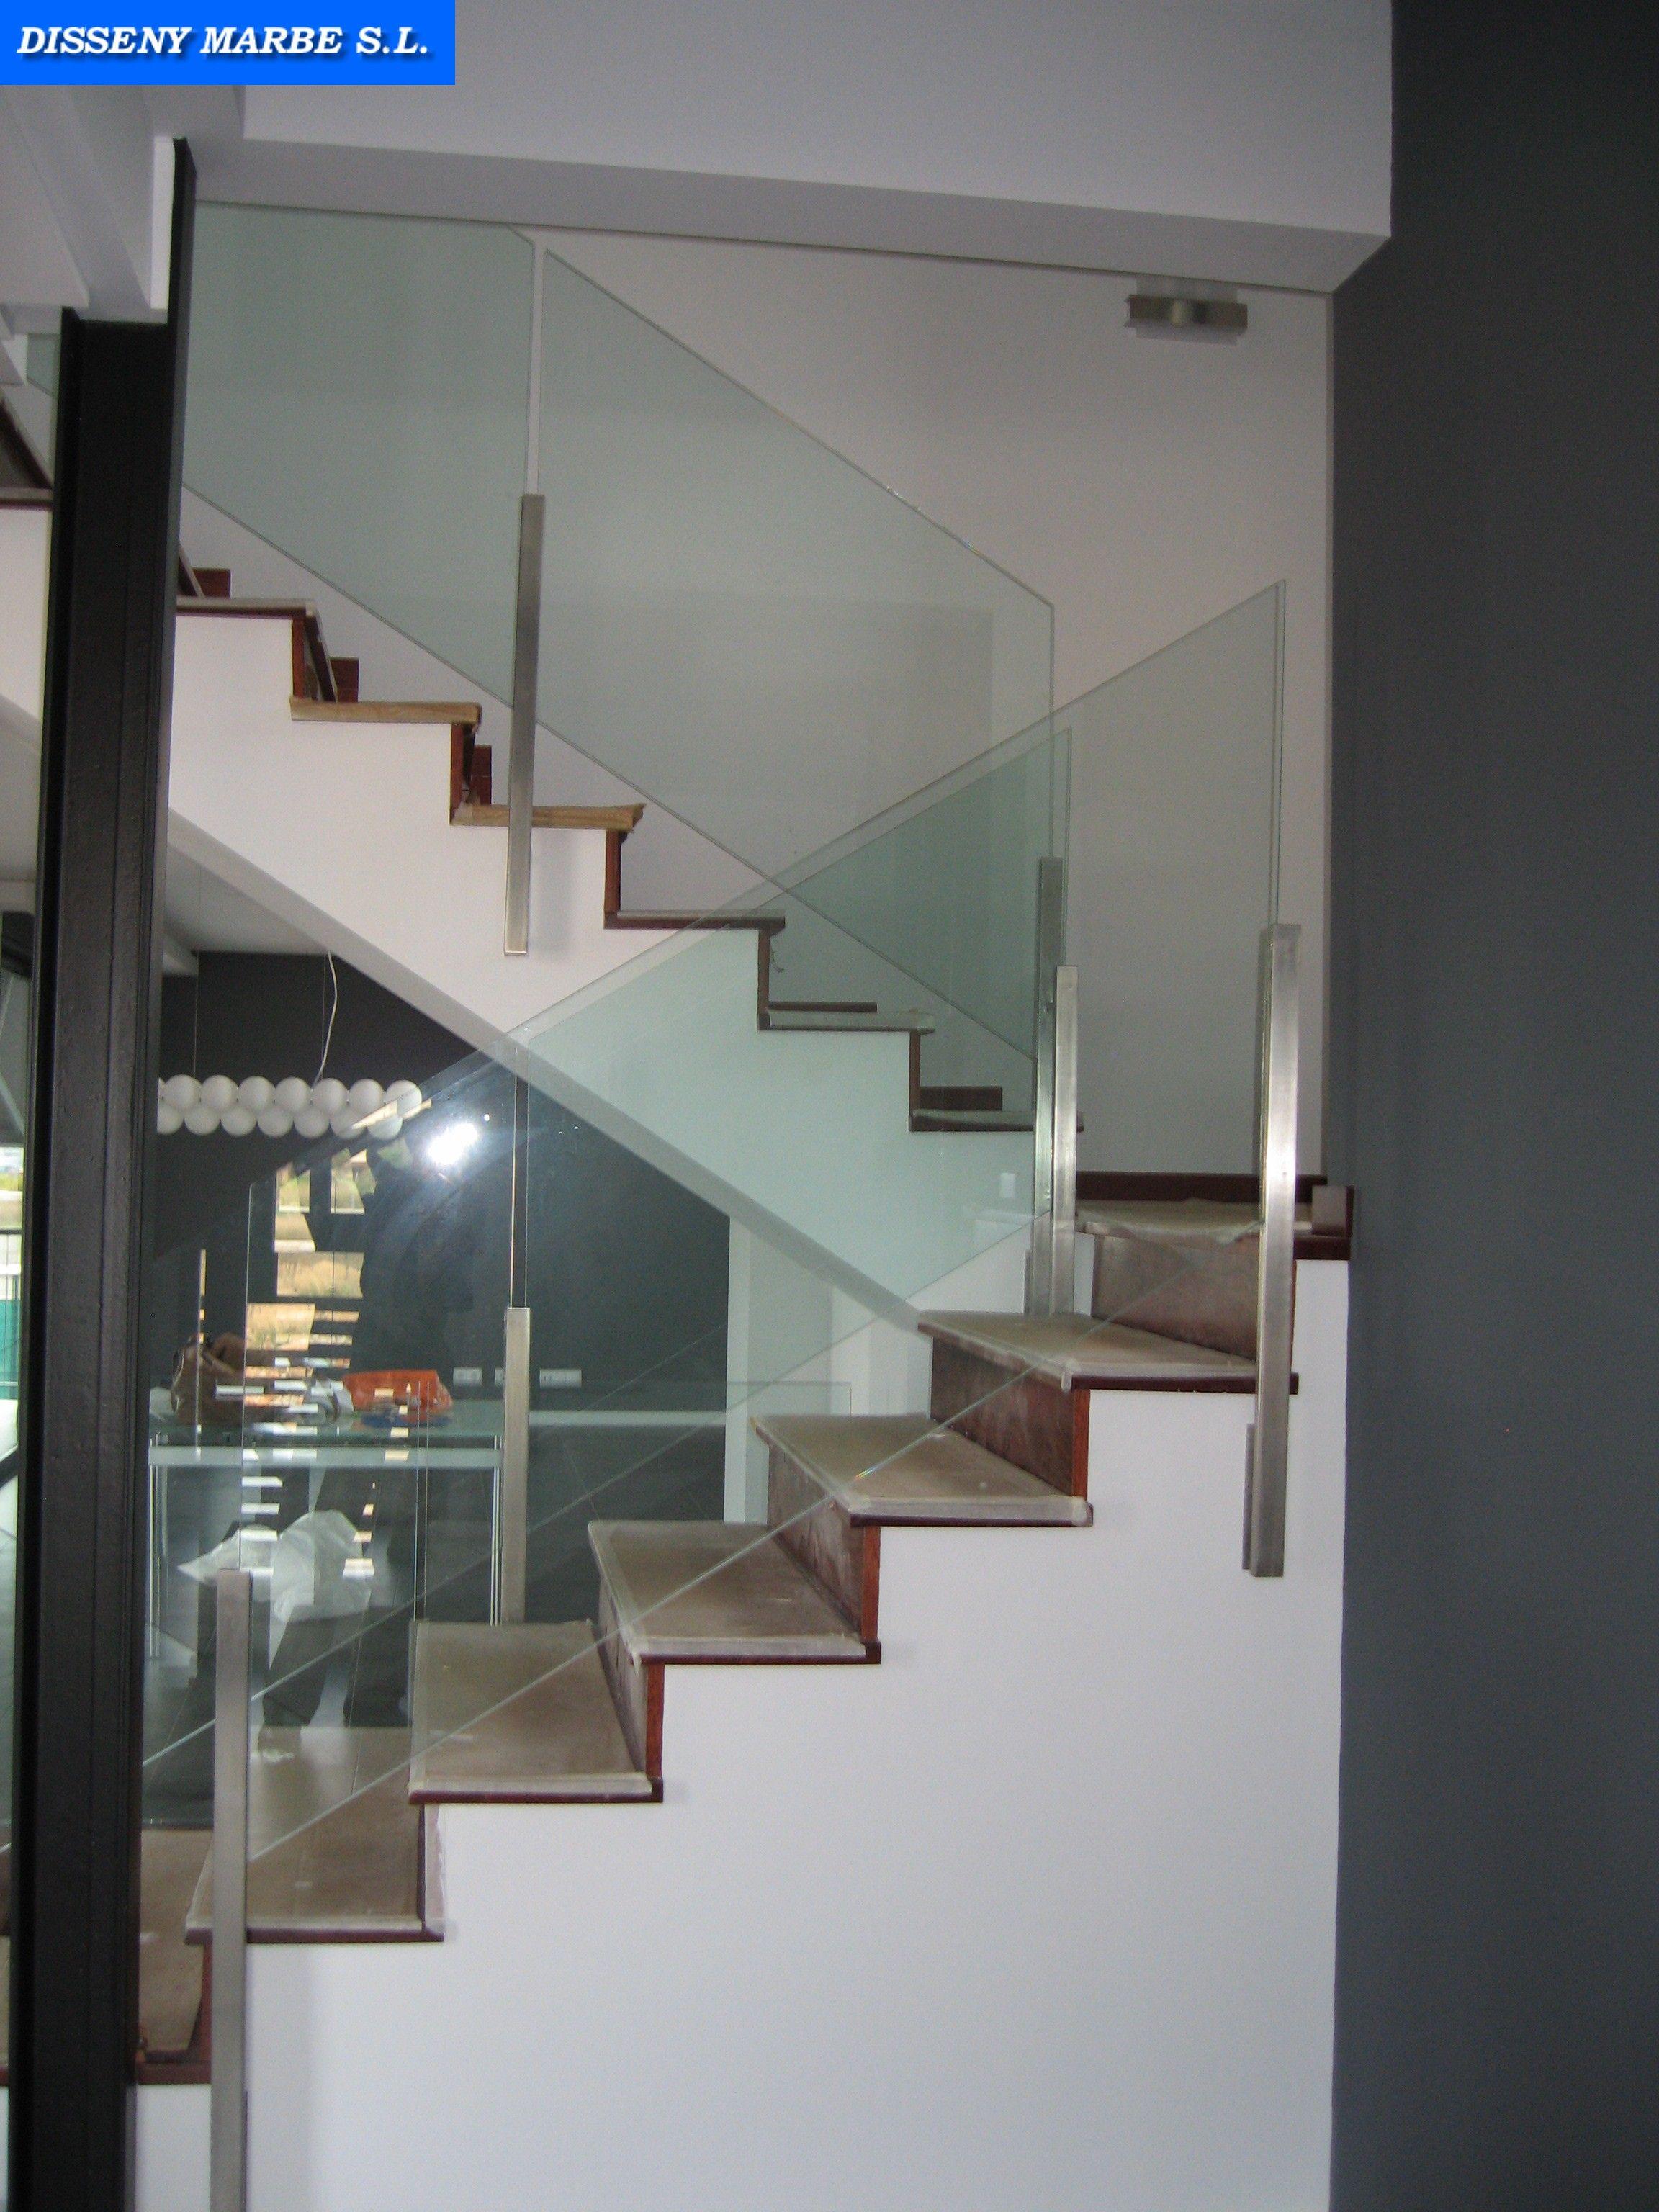 Barandilla escalera de cristal con ejes de acero - Escaleras de acero y cristal ...